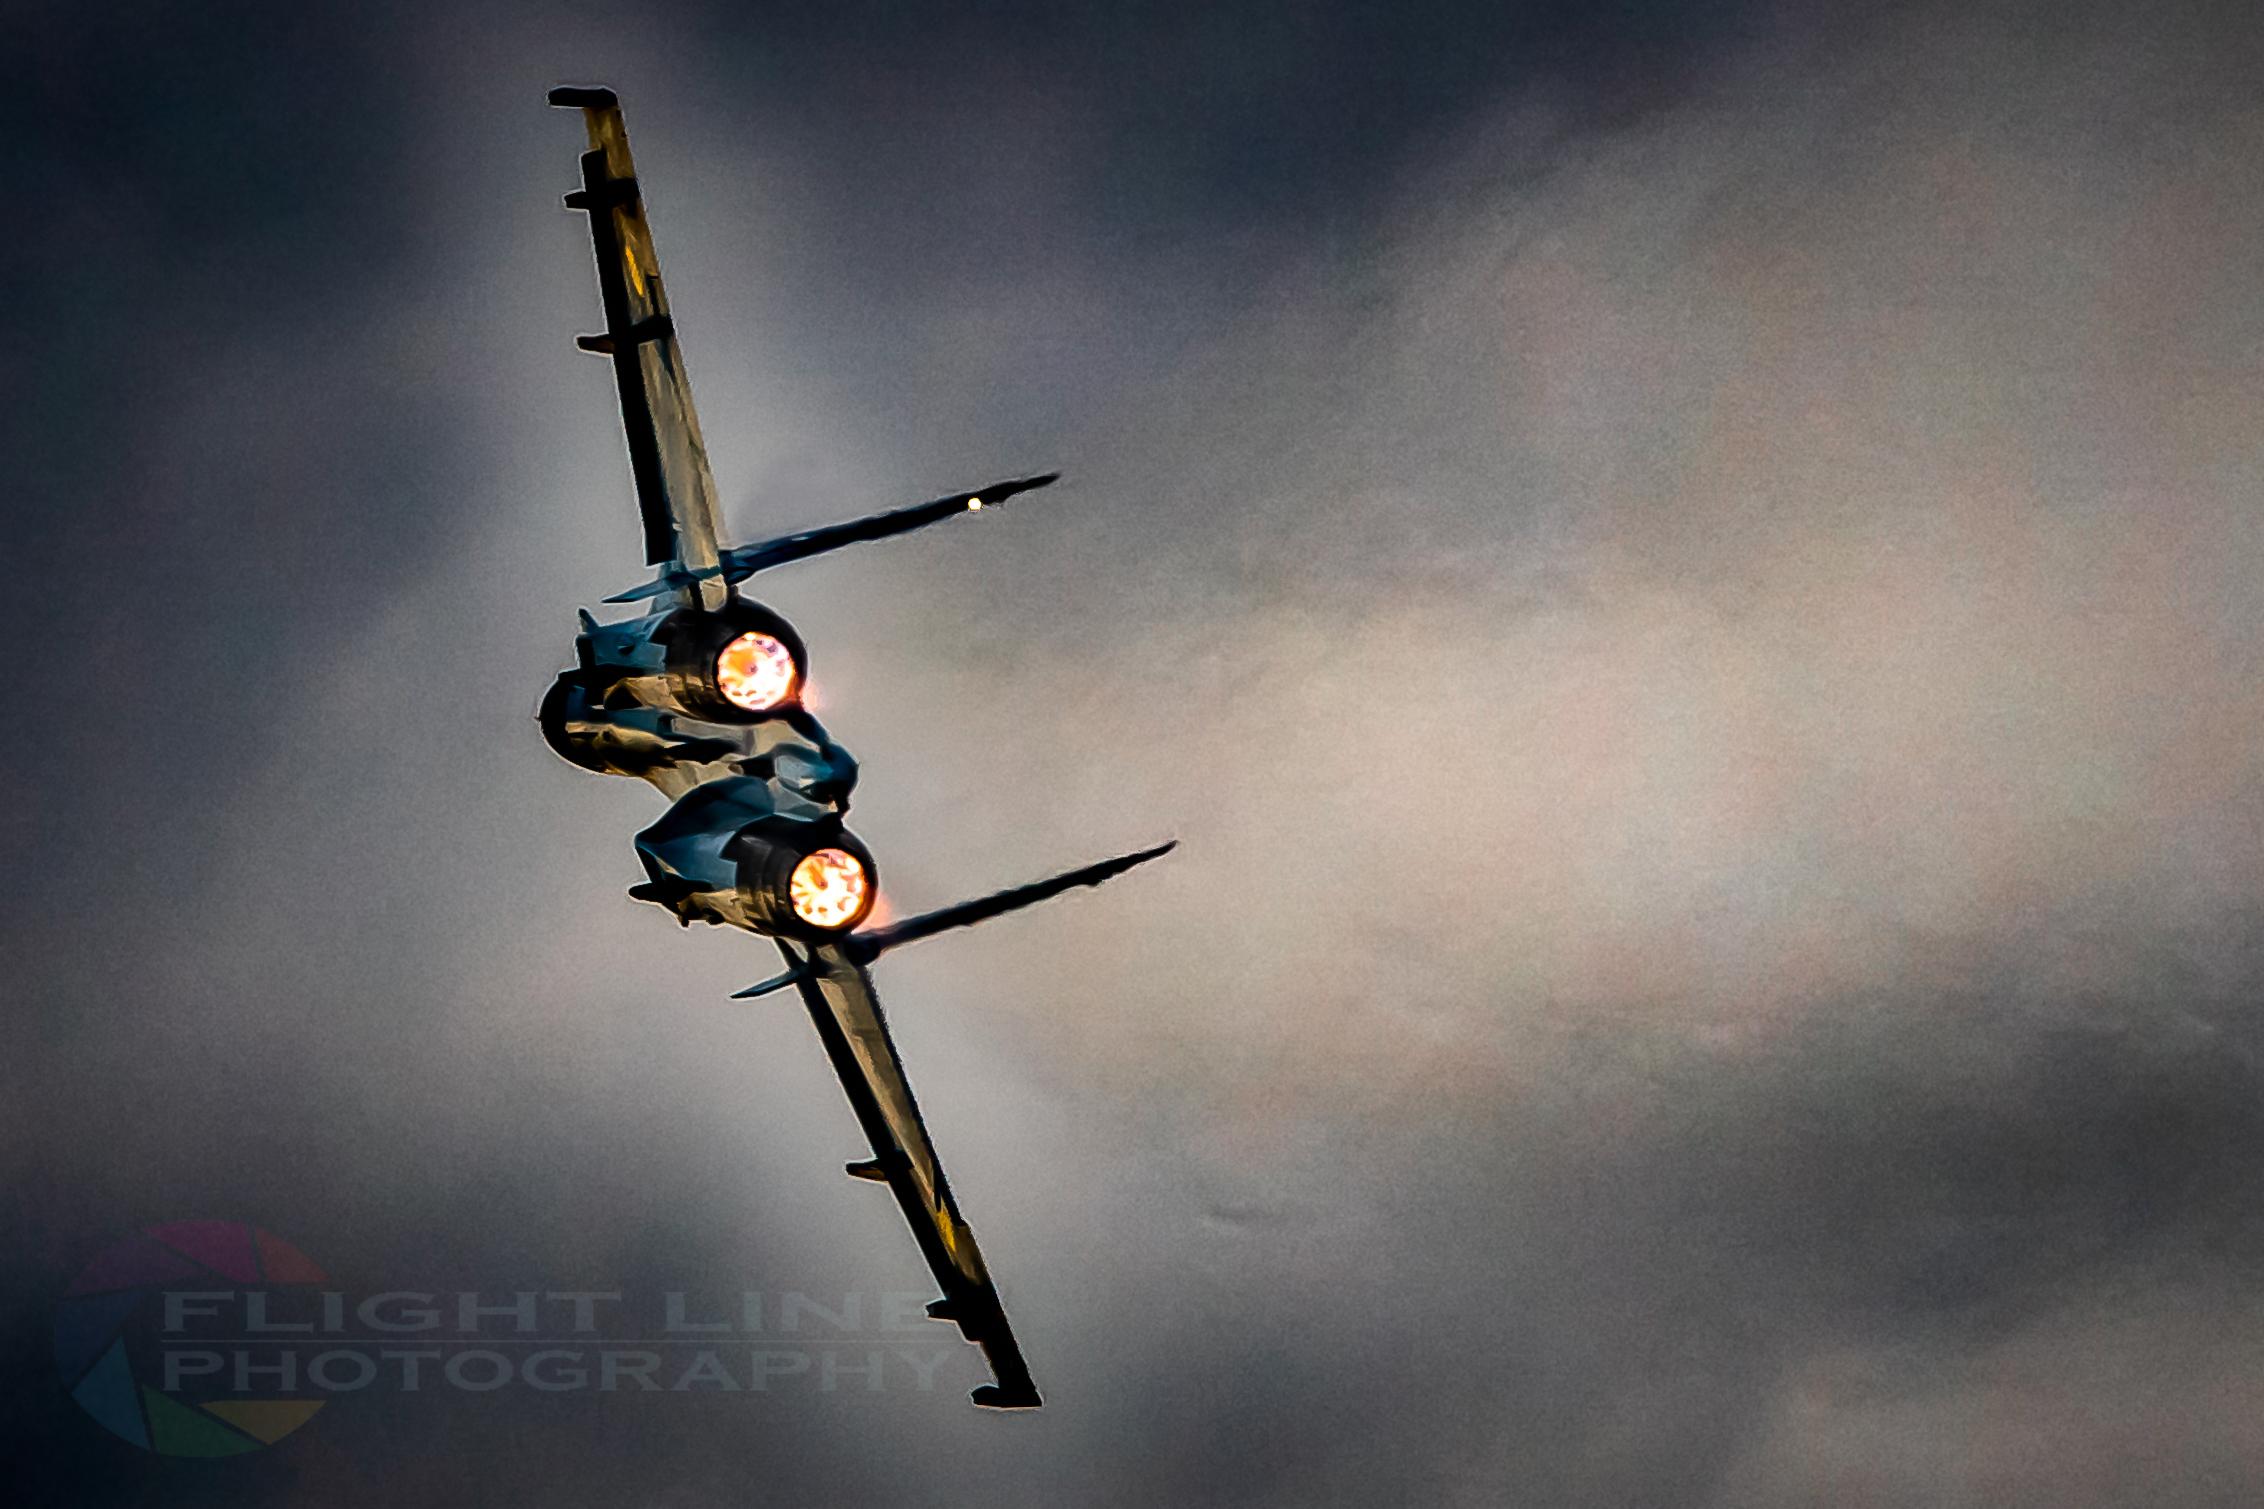 Ukrainian Su-27 'Flanker'